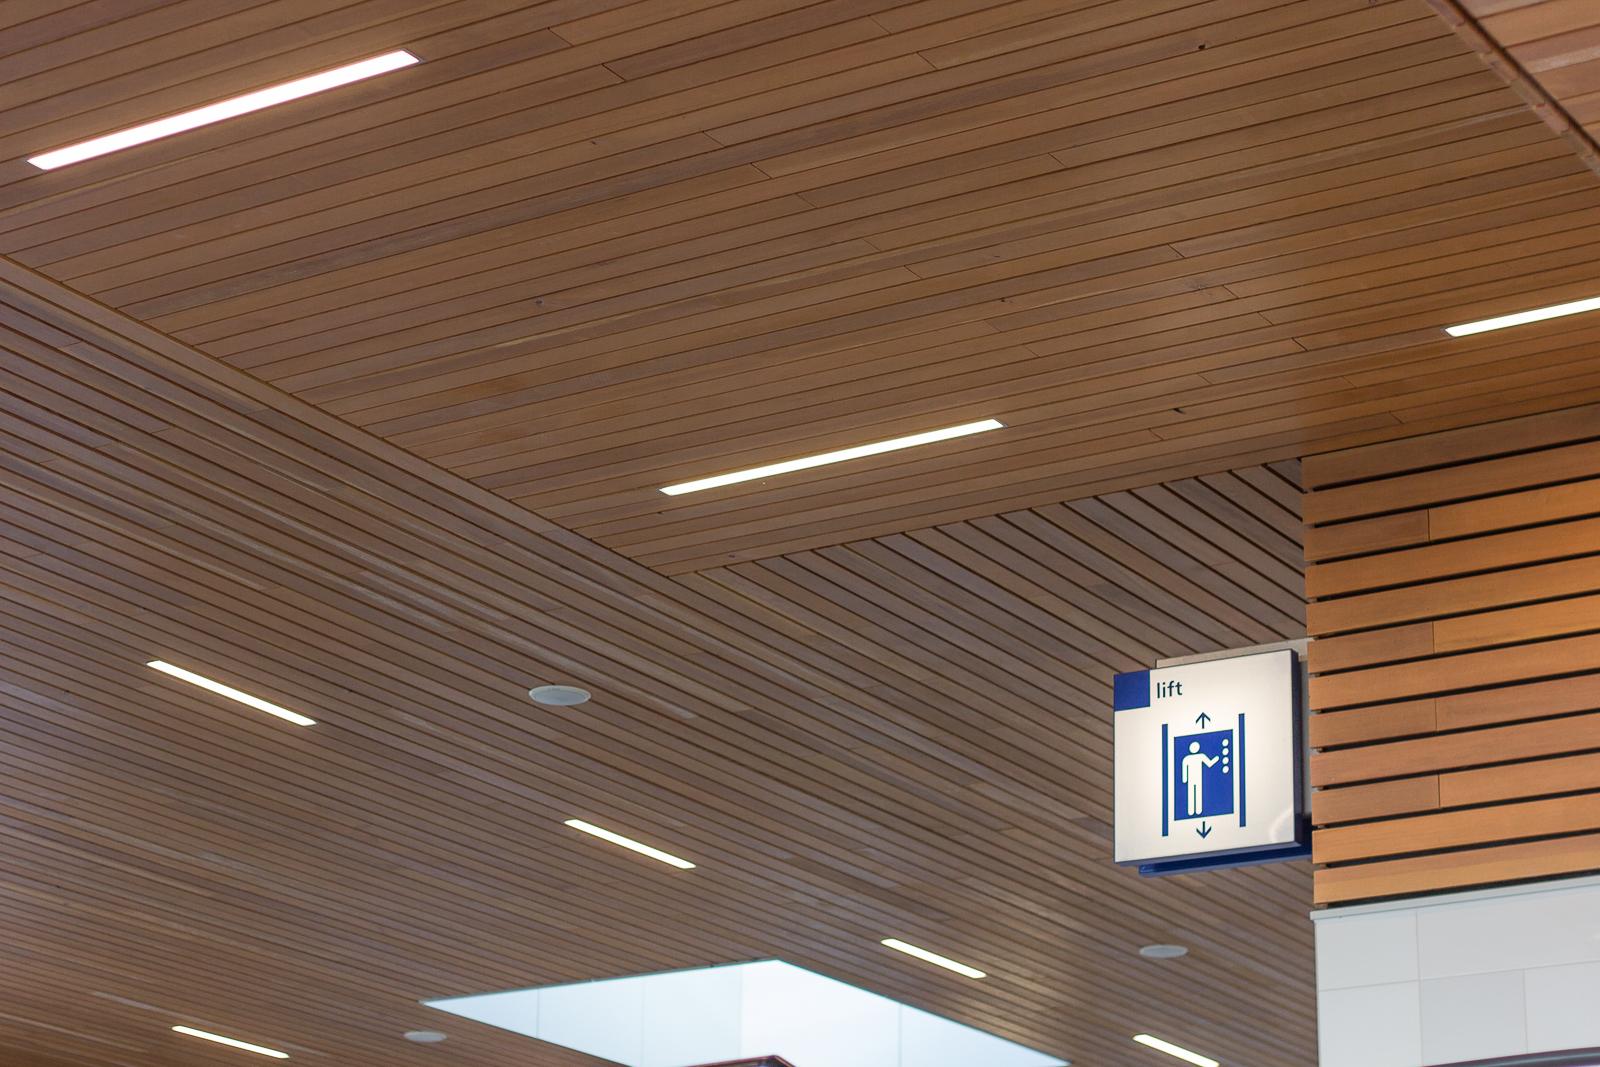 station_alkmaar_11